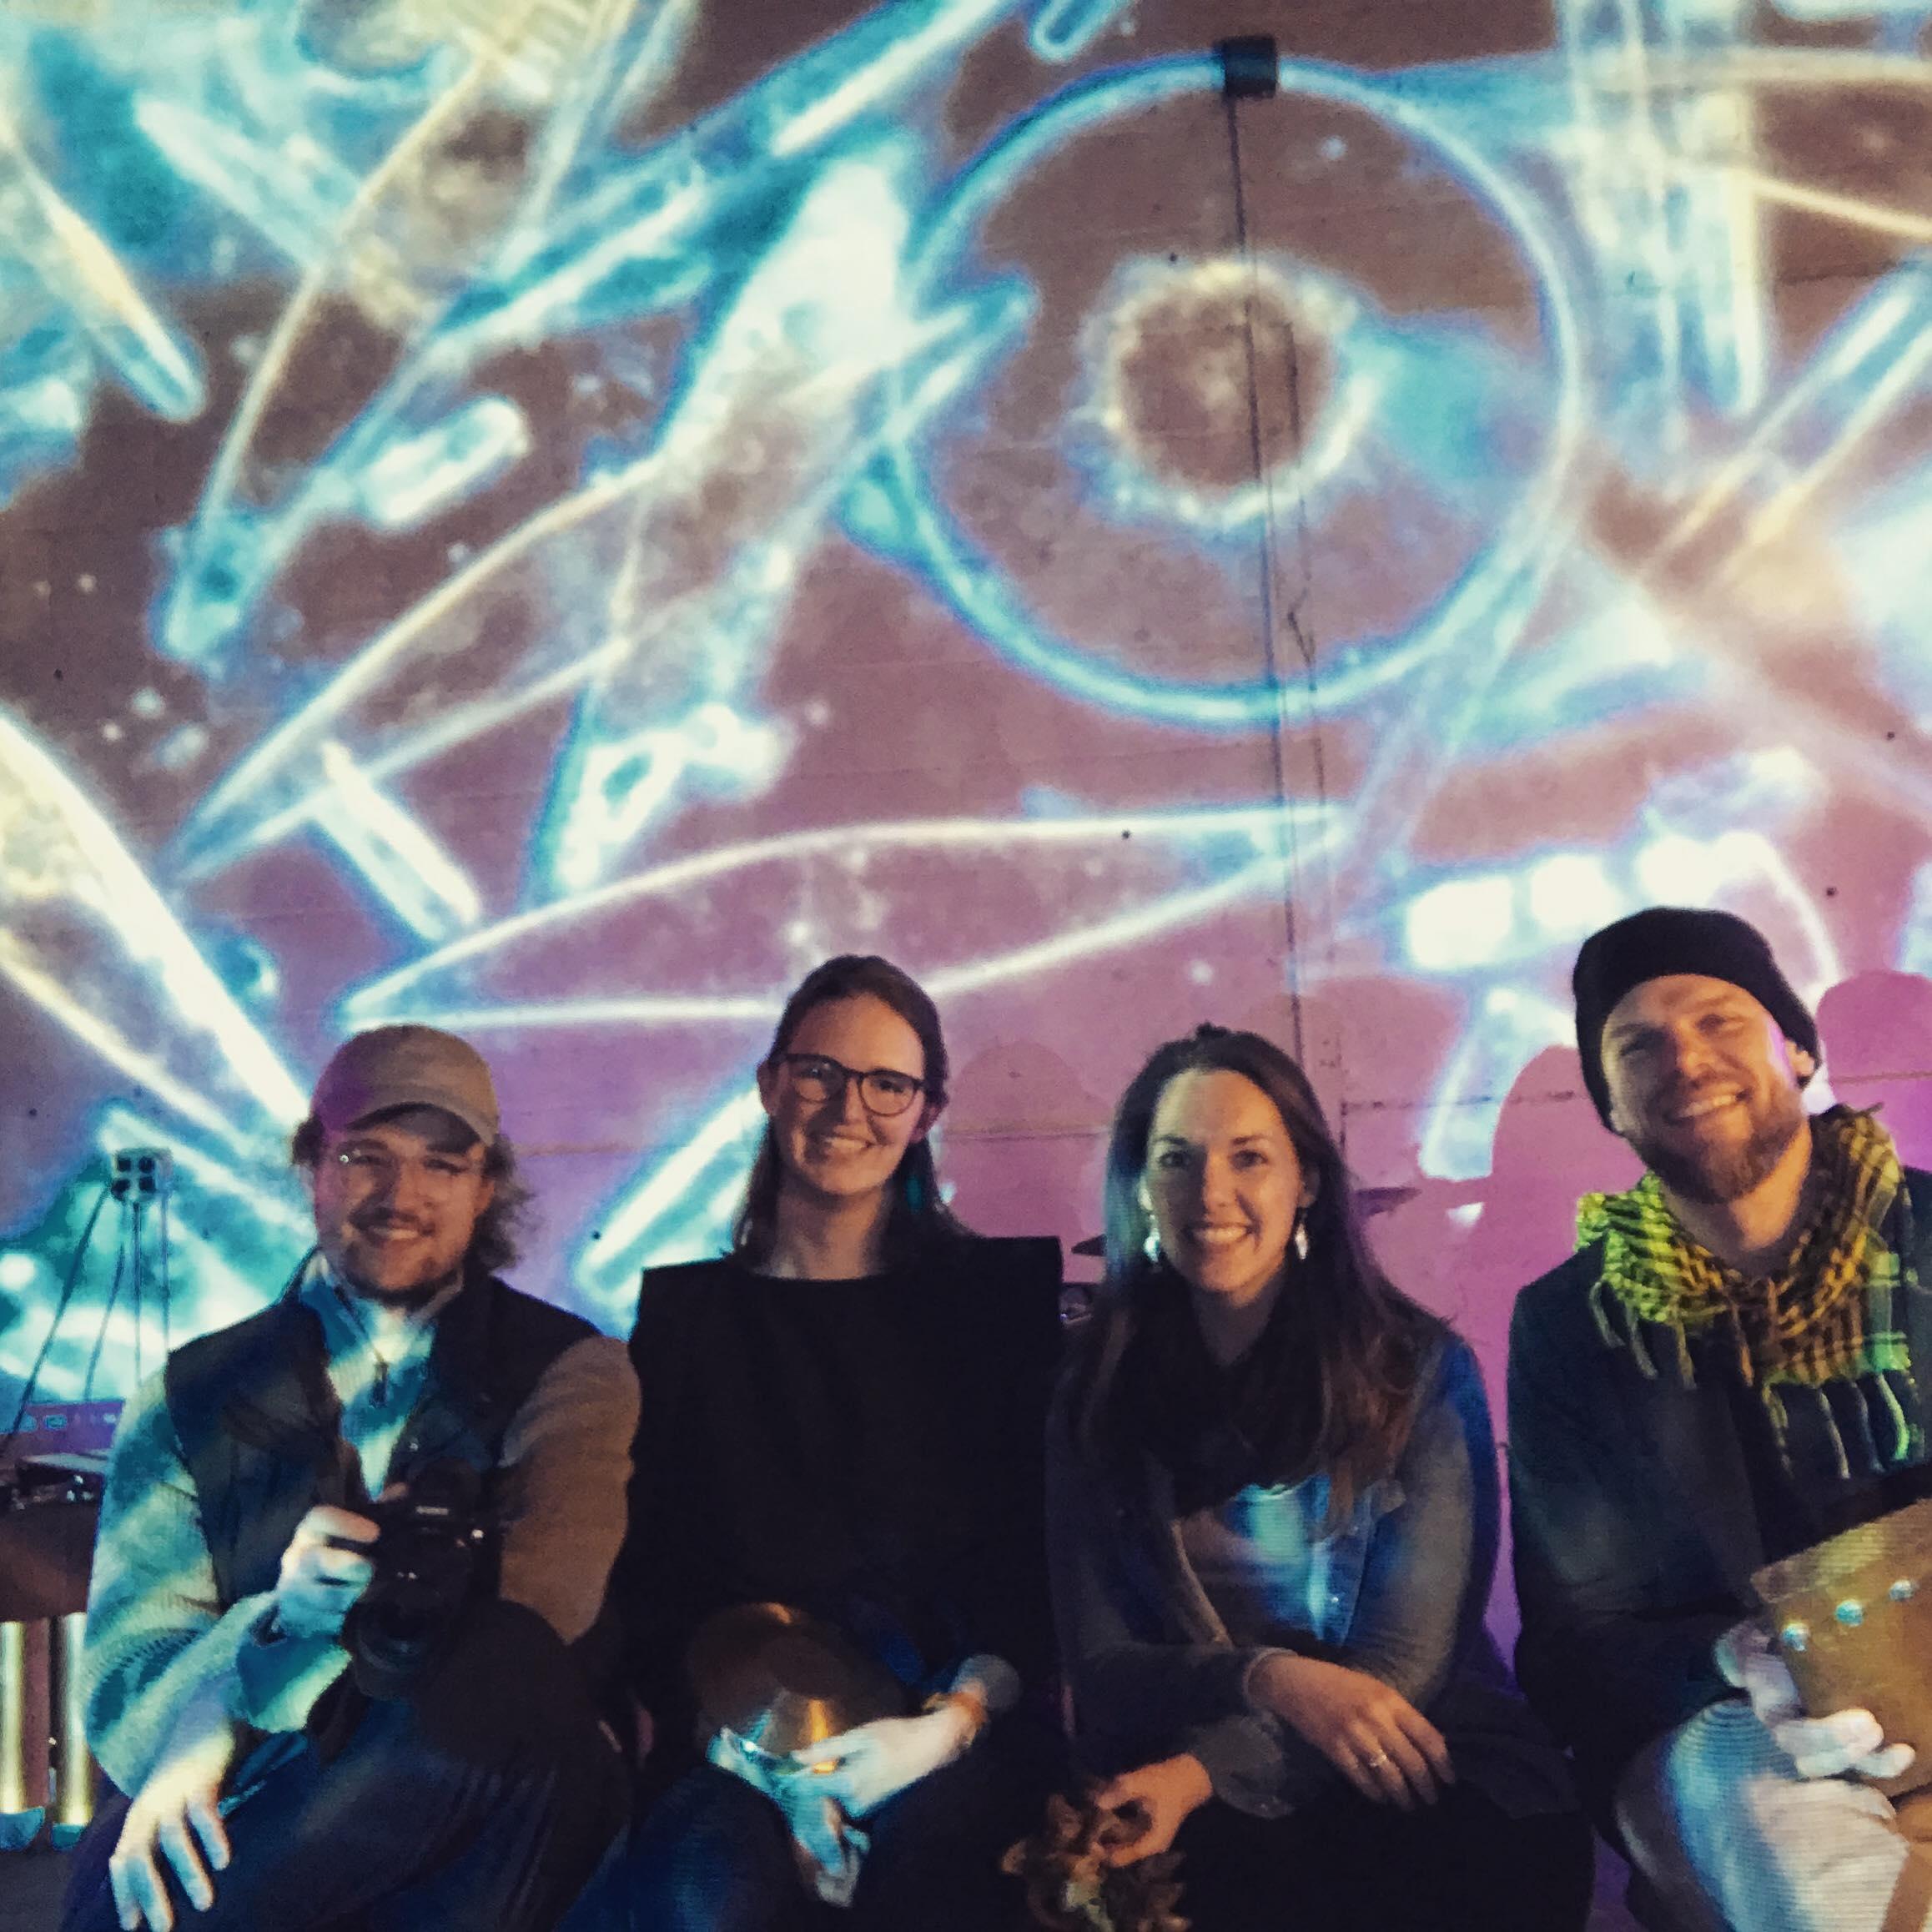 The Masary Studios team -Sam Okerstrom-Lang, Maria Finkelmeier and Ryan Edwards